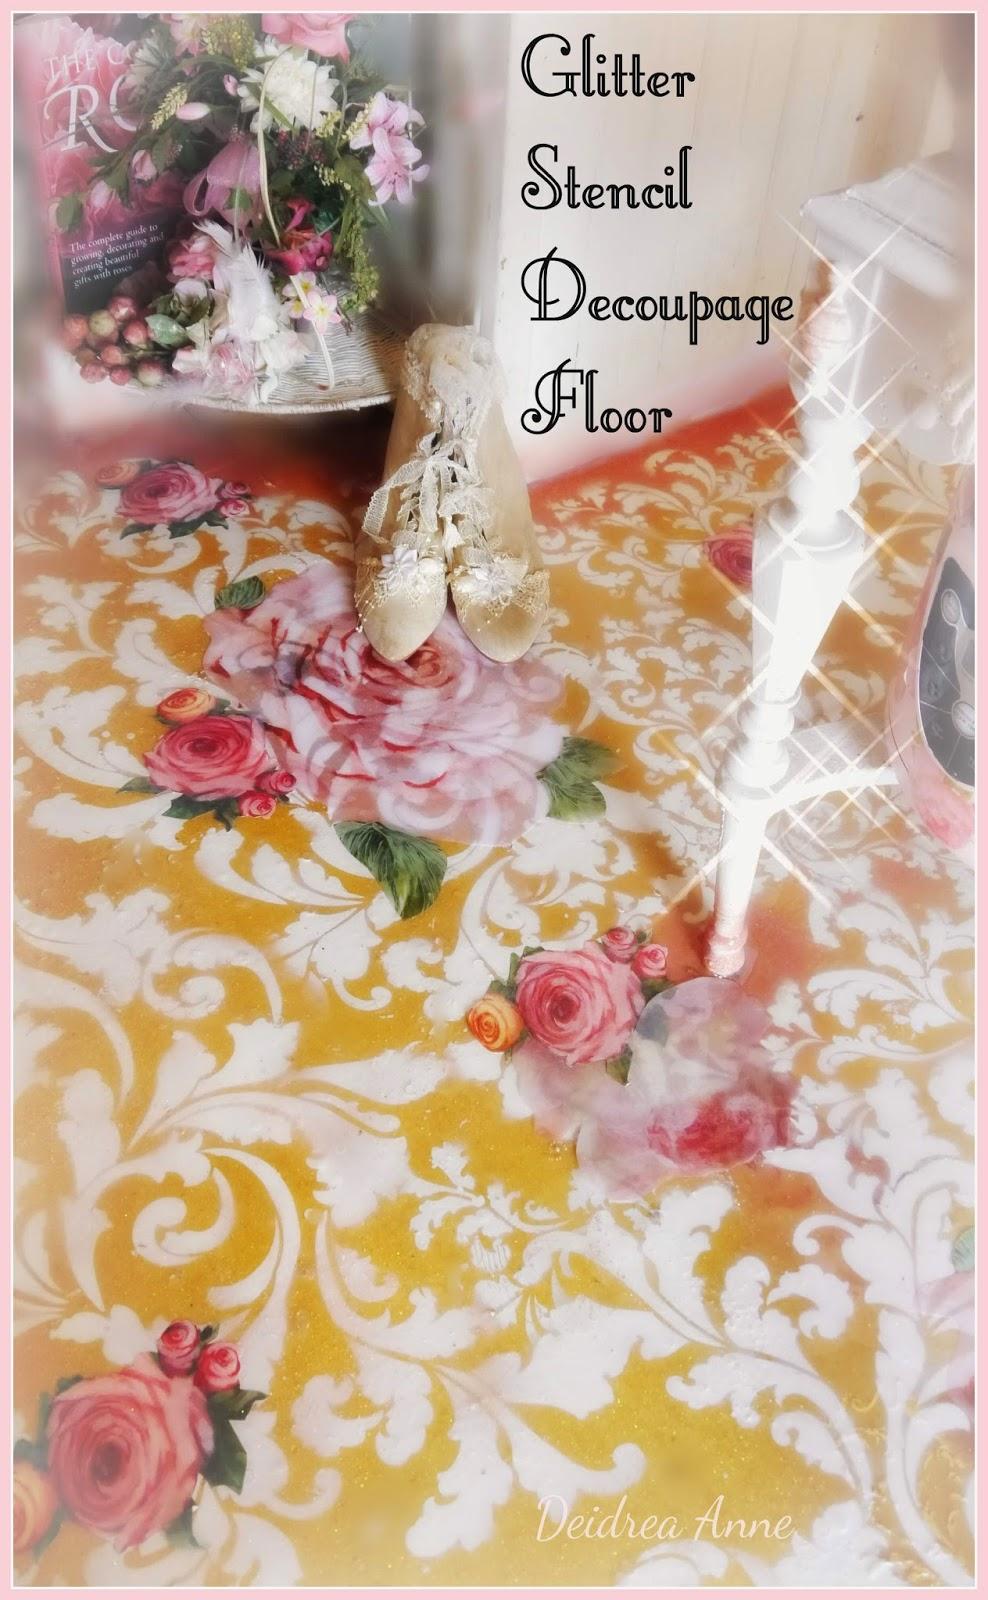 Suzy Homefaker Recycled Painted Linoleum Kitchen Glitter